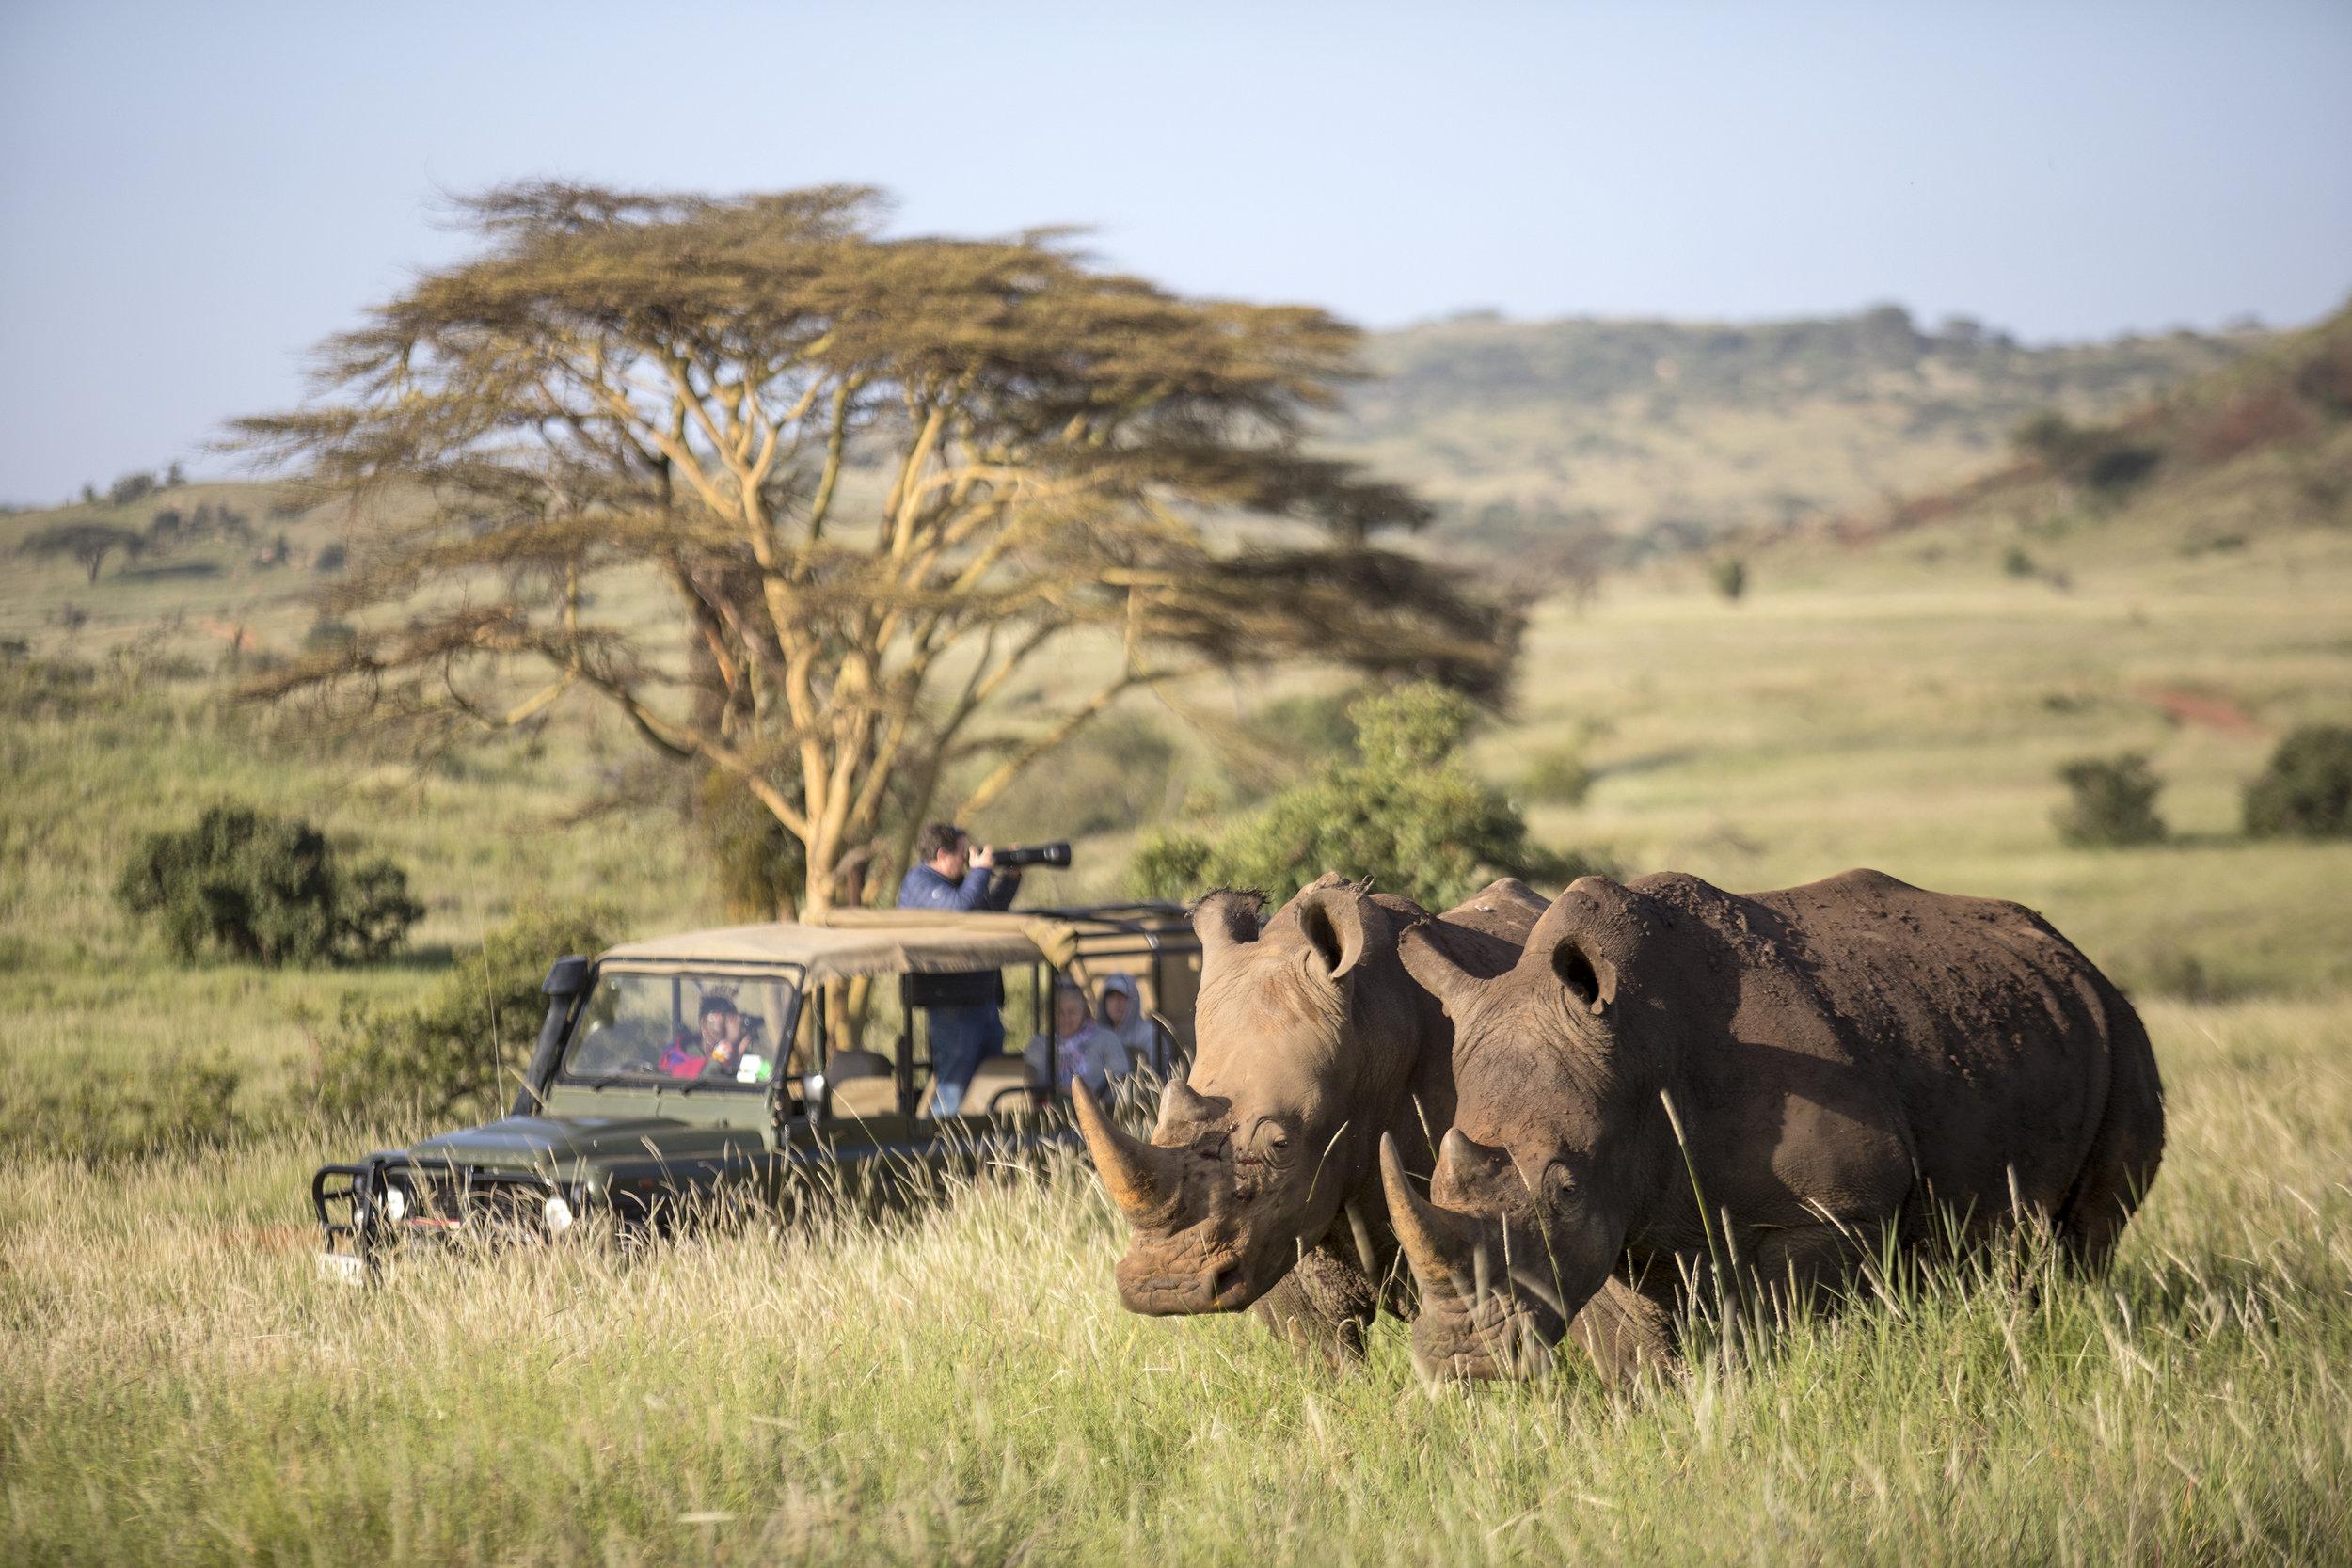 Exotic-yoga-retreats-kenya-yoga-safari.jpg